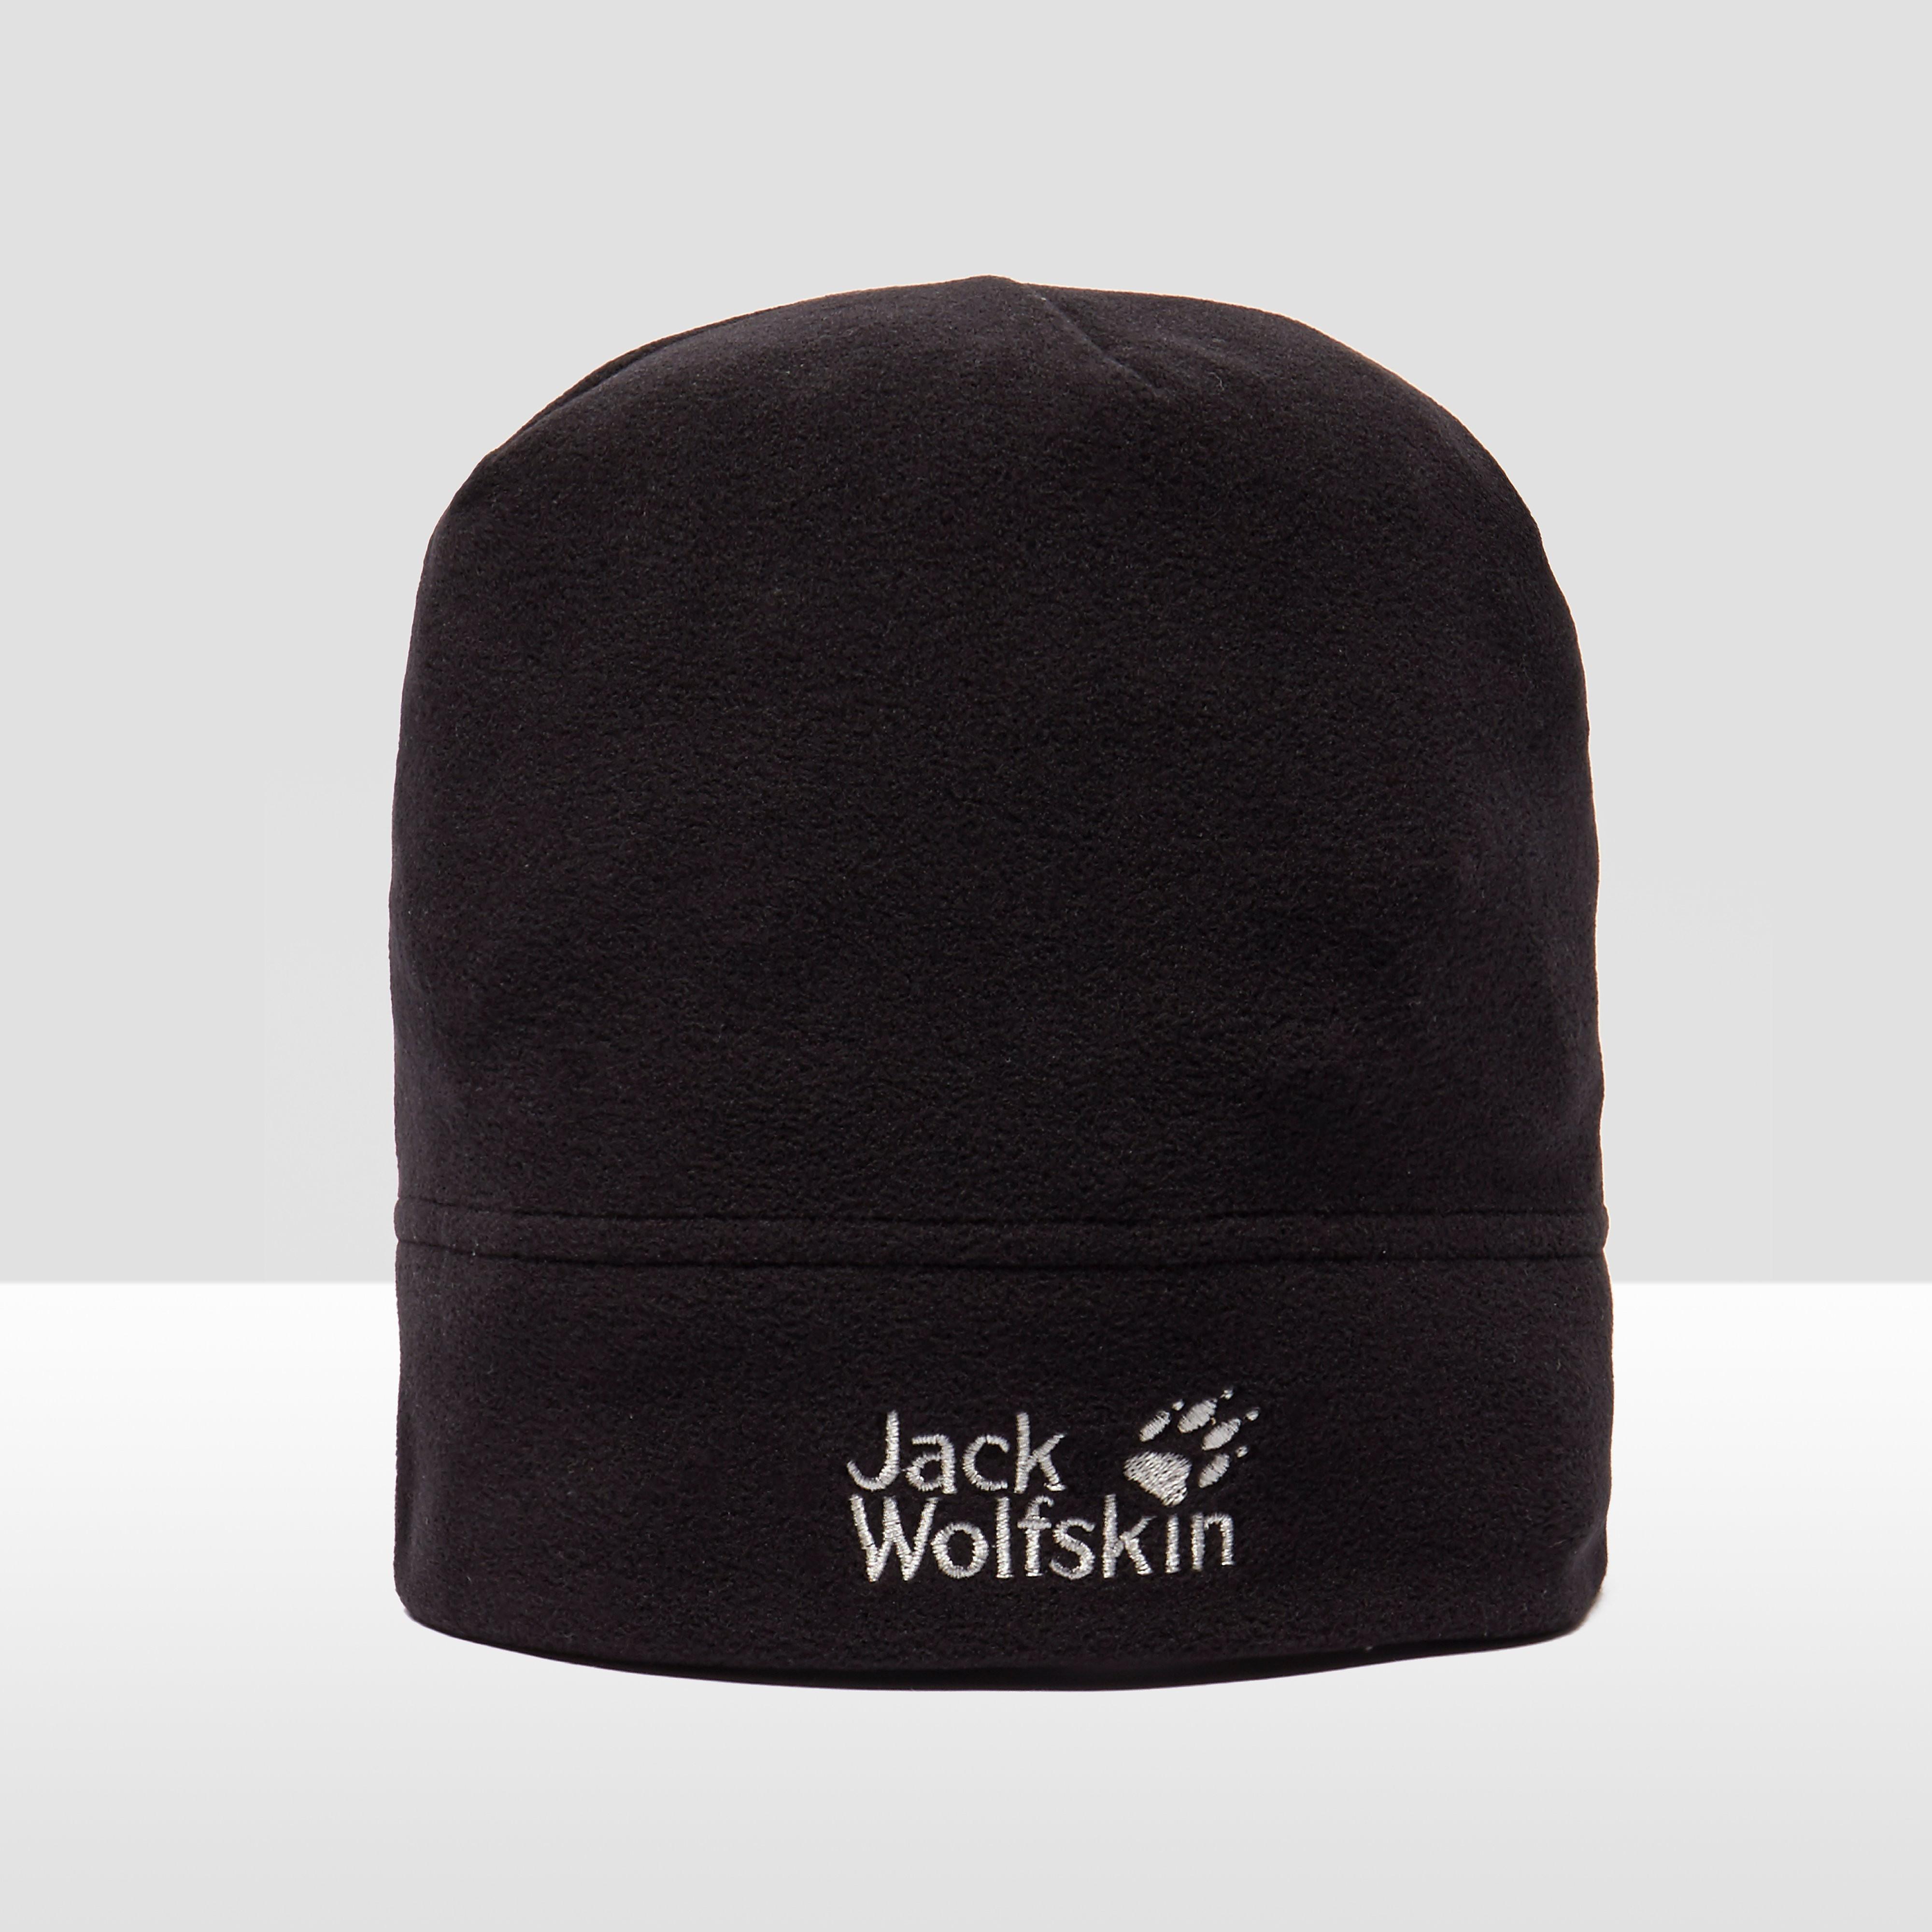 Jack Wolfskin Real Stuff Hat